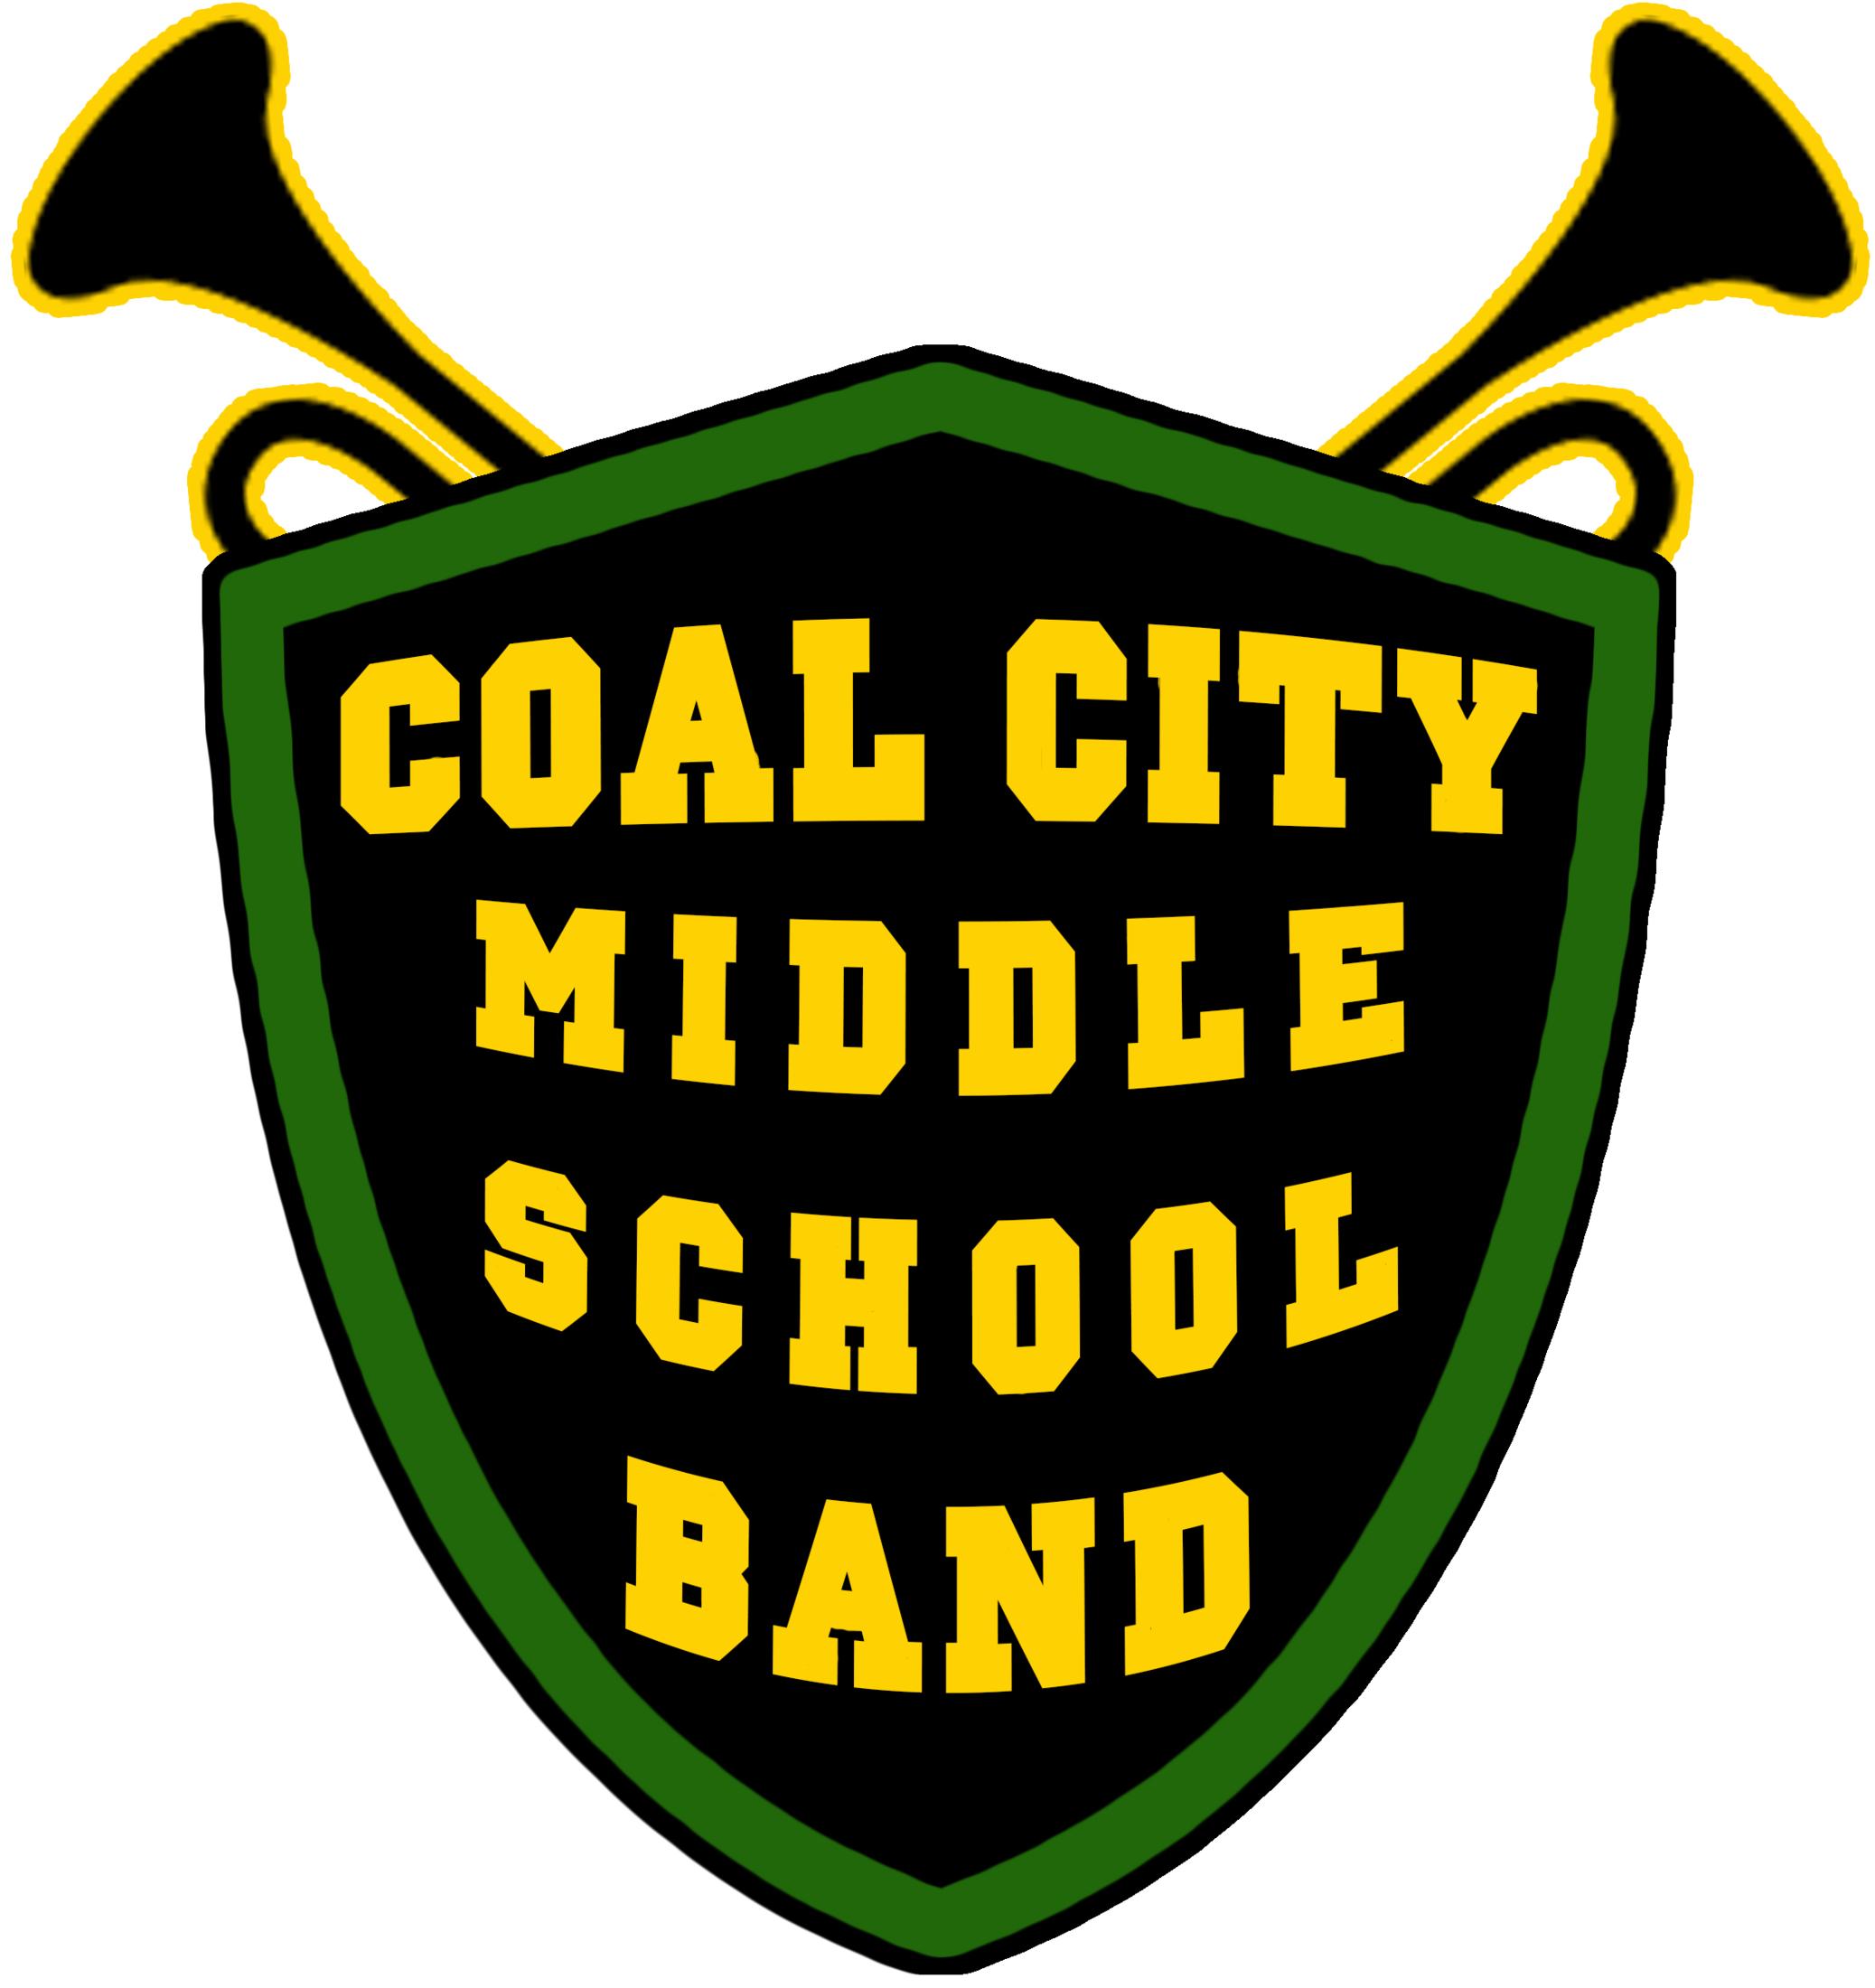 Coal City Middle School Band logo